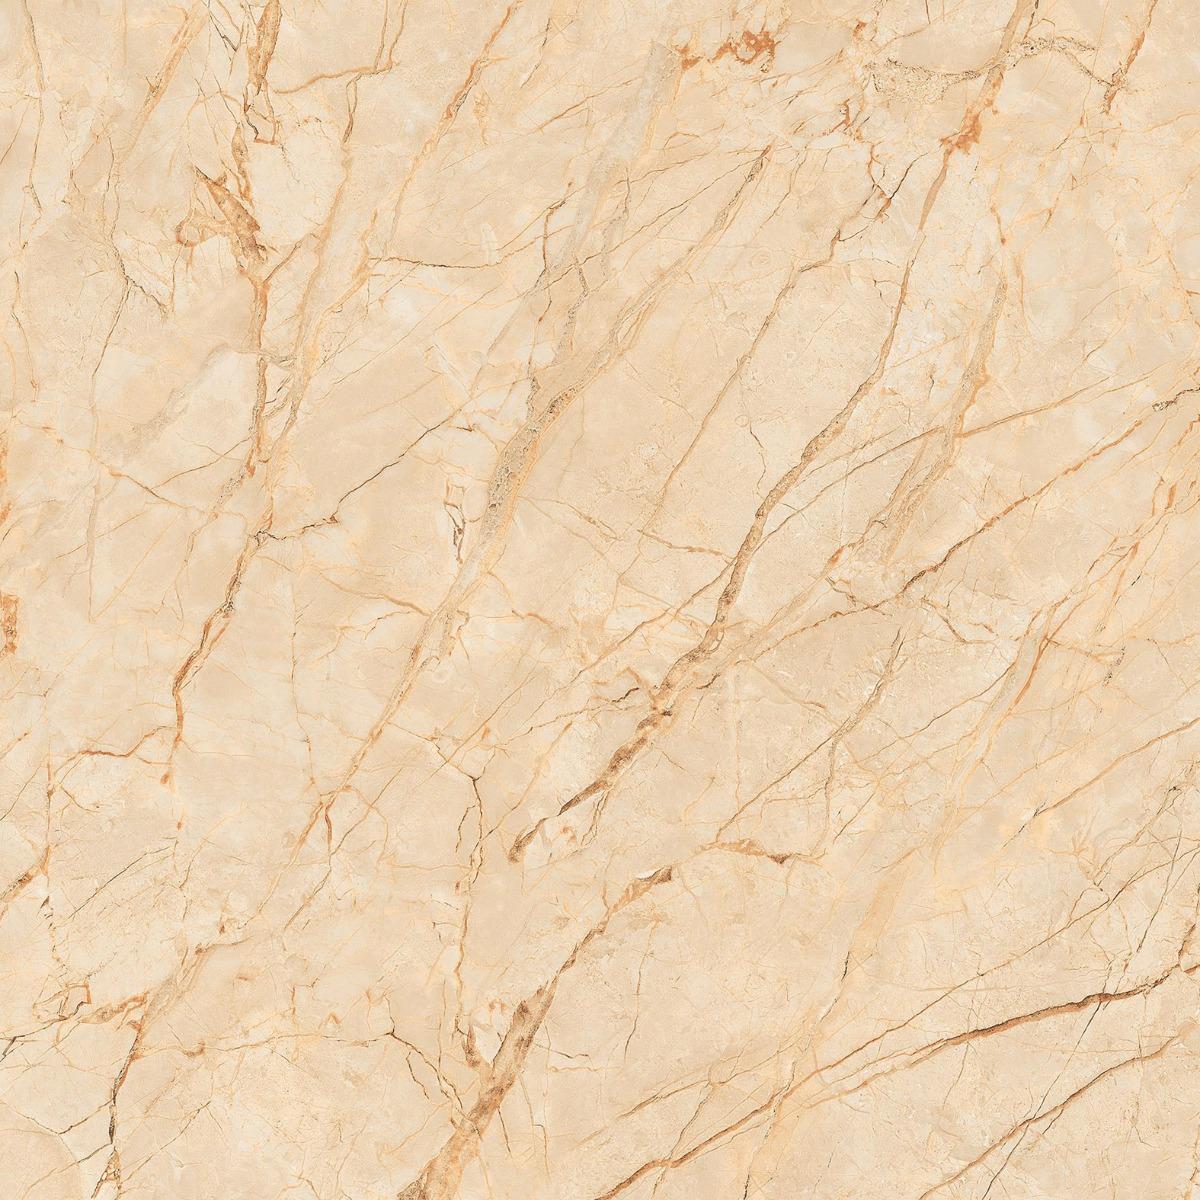 PGVT Sofitel Gold Marble